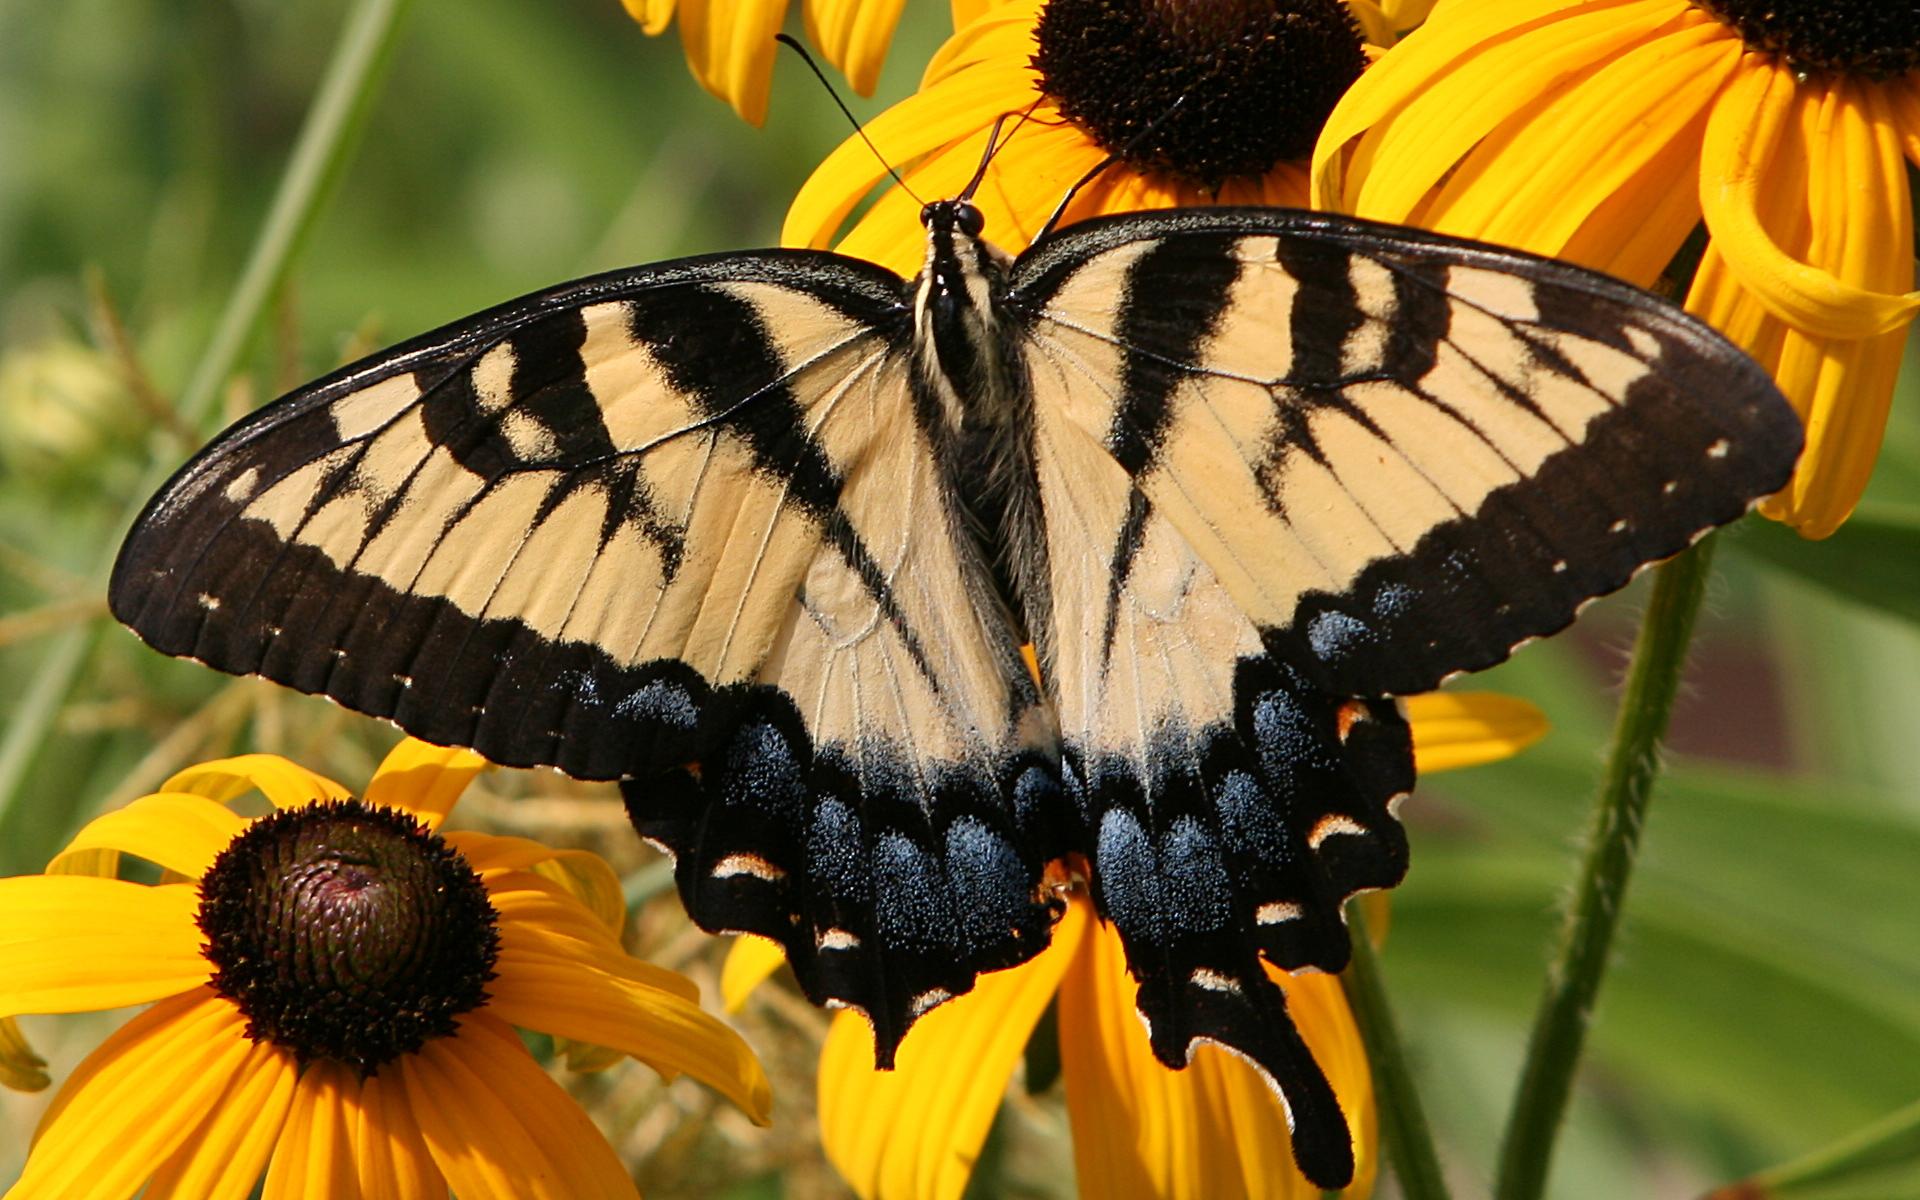 Una linda mariposa - 1920x1200